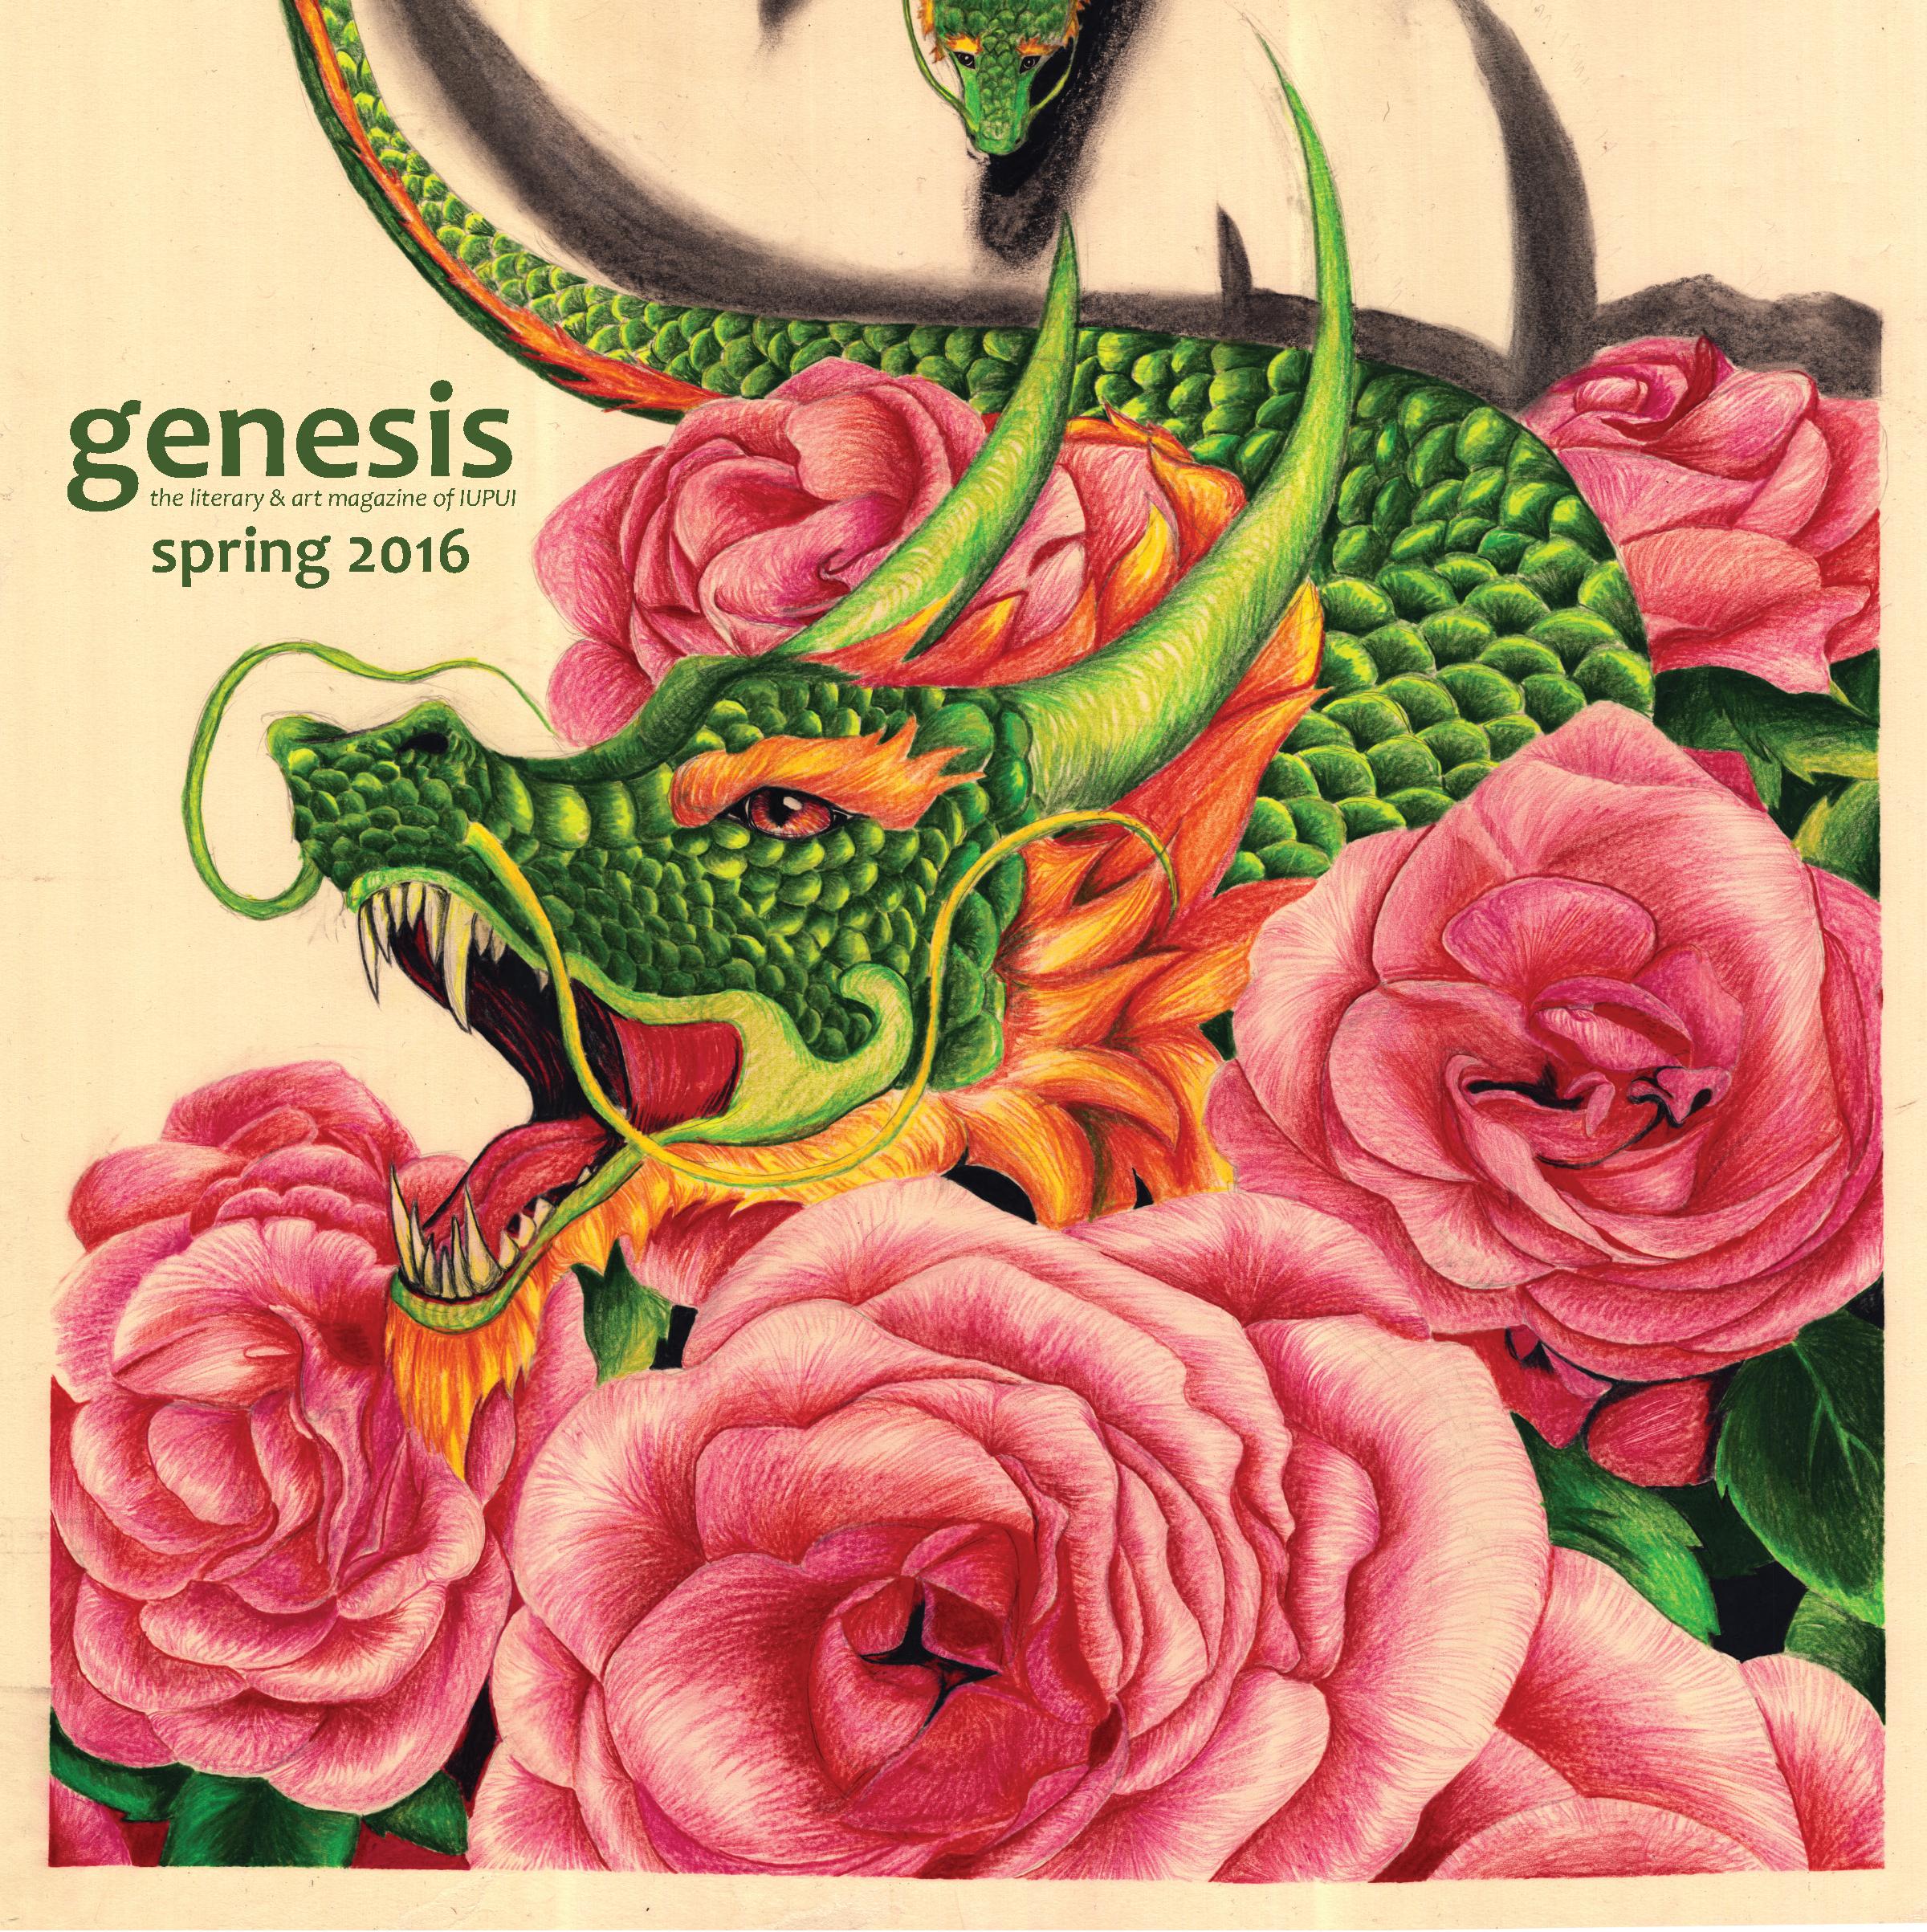 genesis Spring 2016 cover